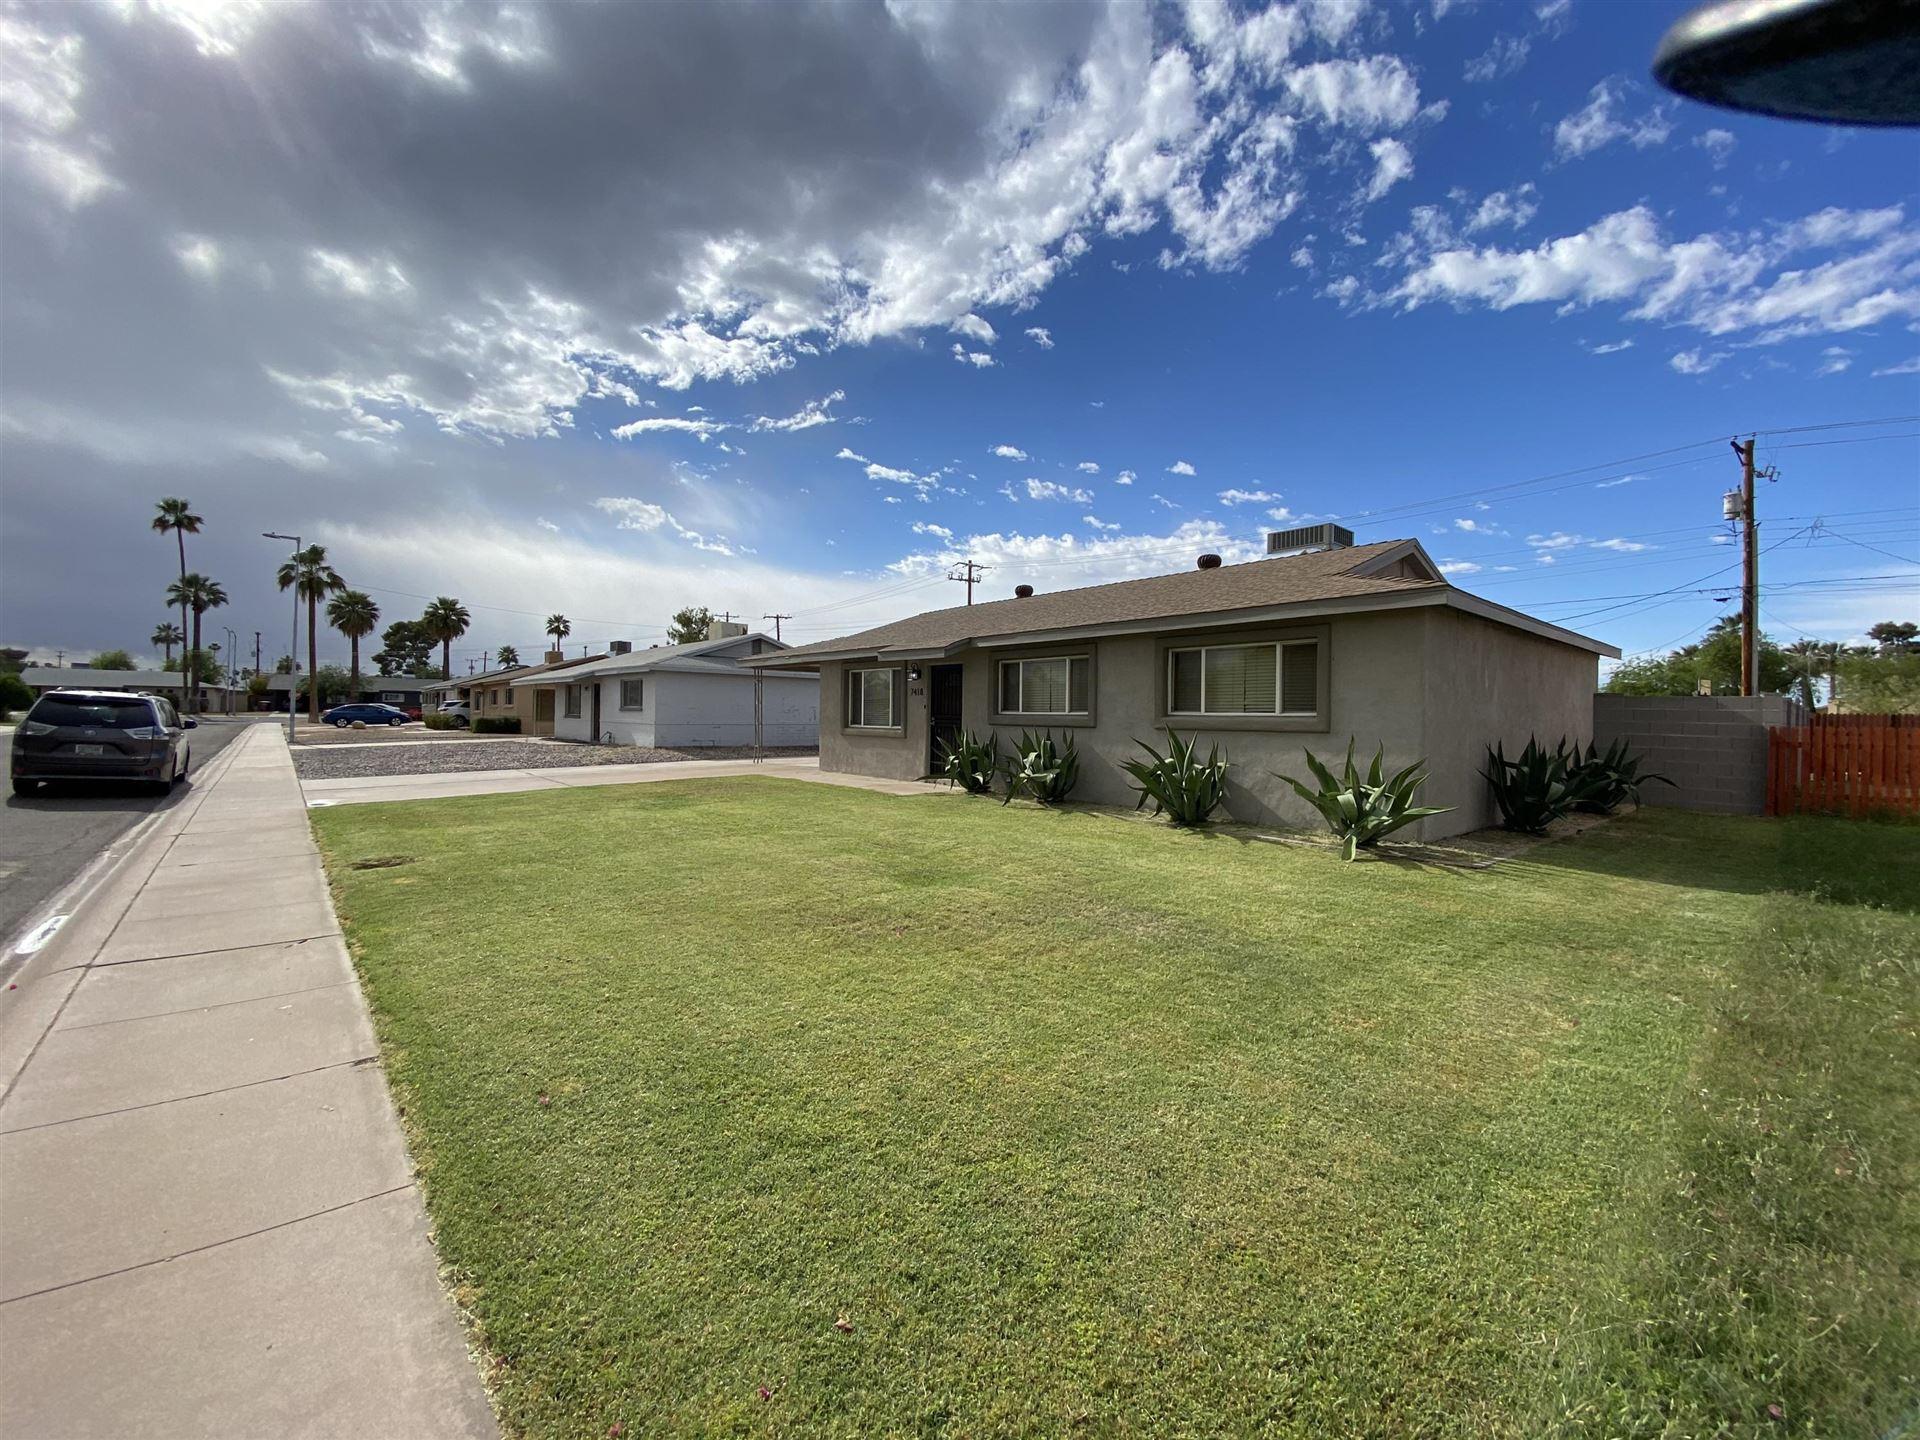 7418 E FILLMORE Street, Scottsdale, AZ 85257 - MLS#: 6233294